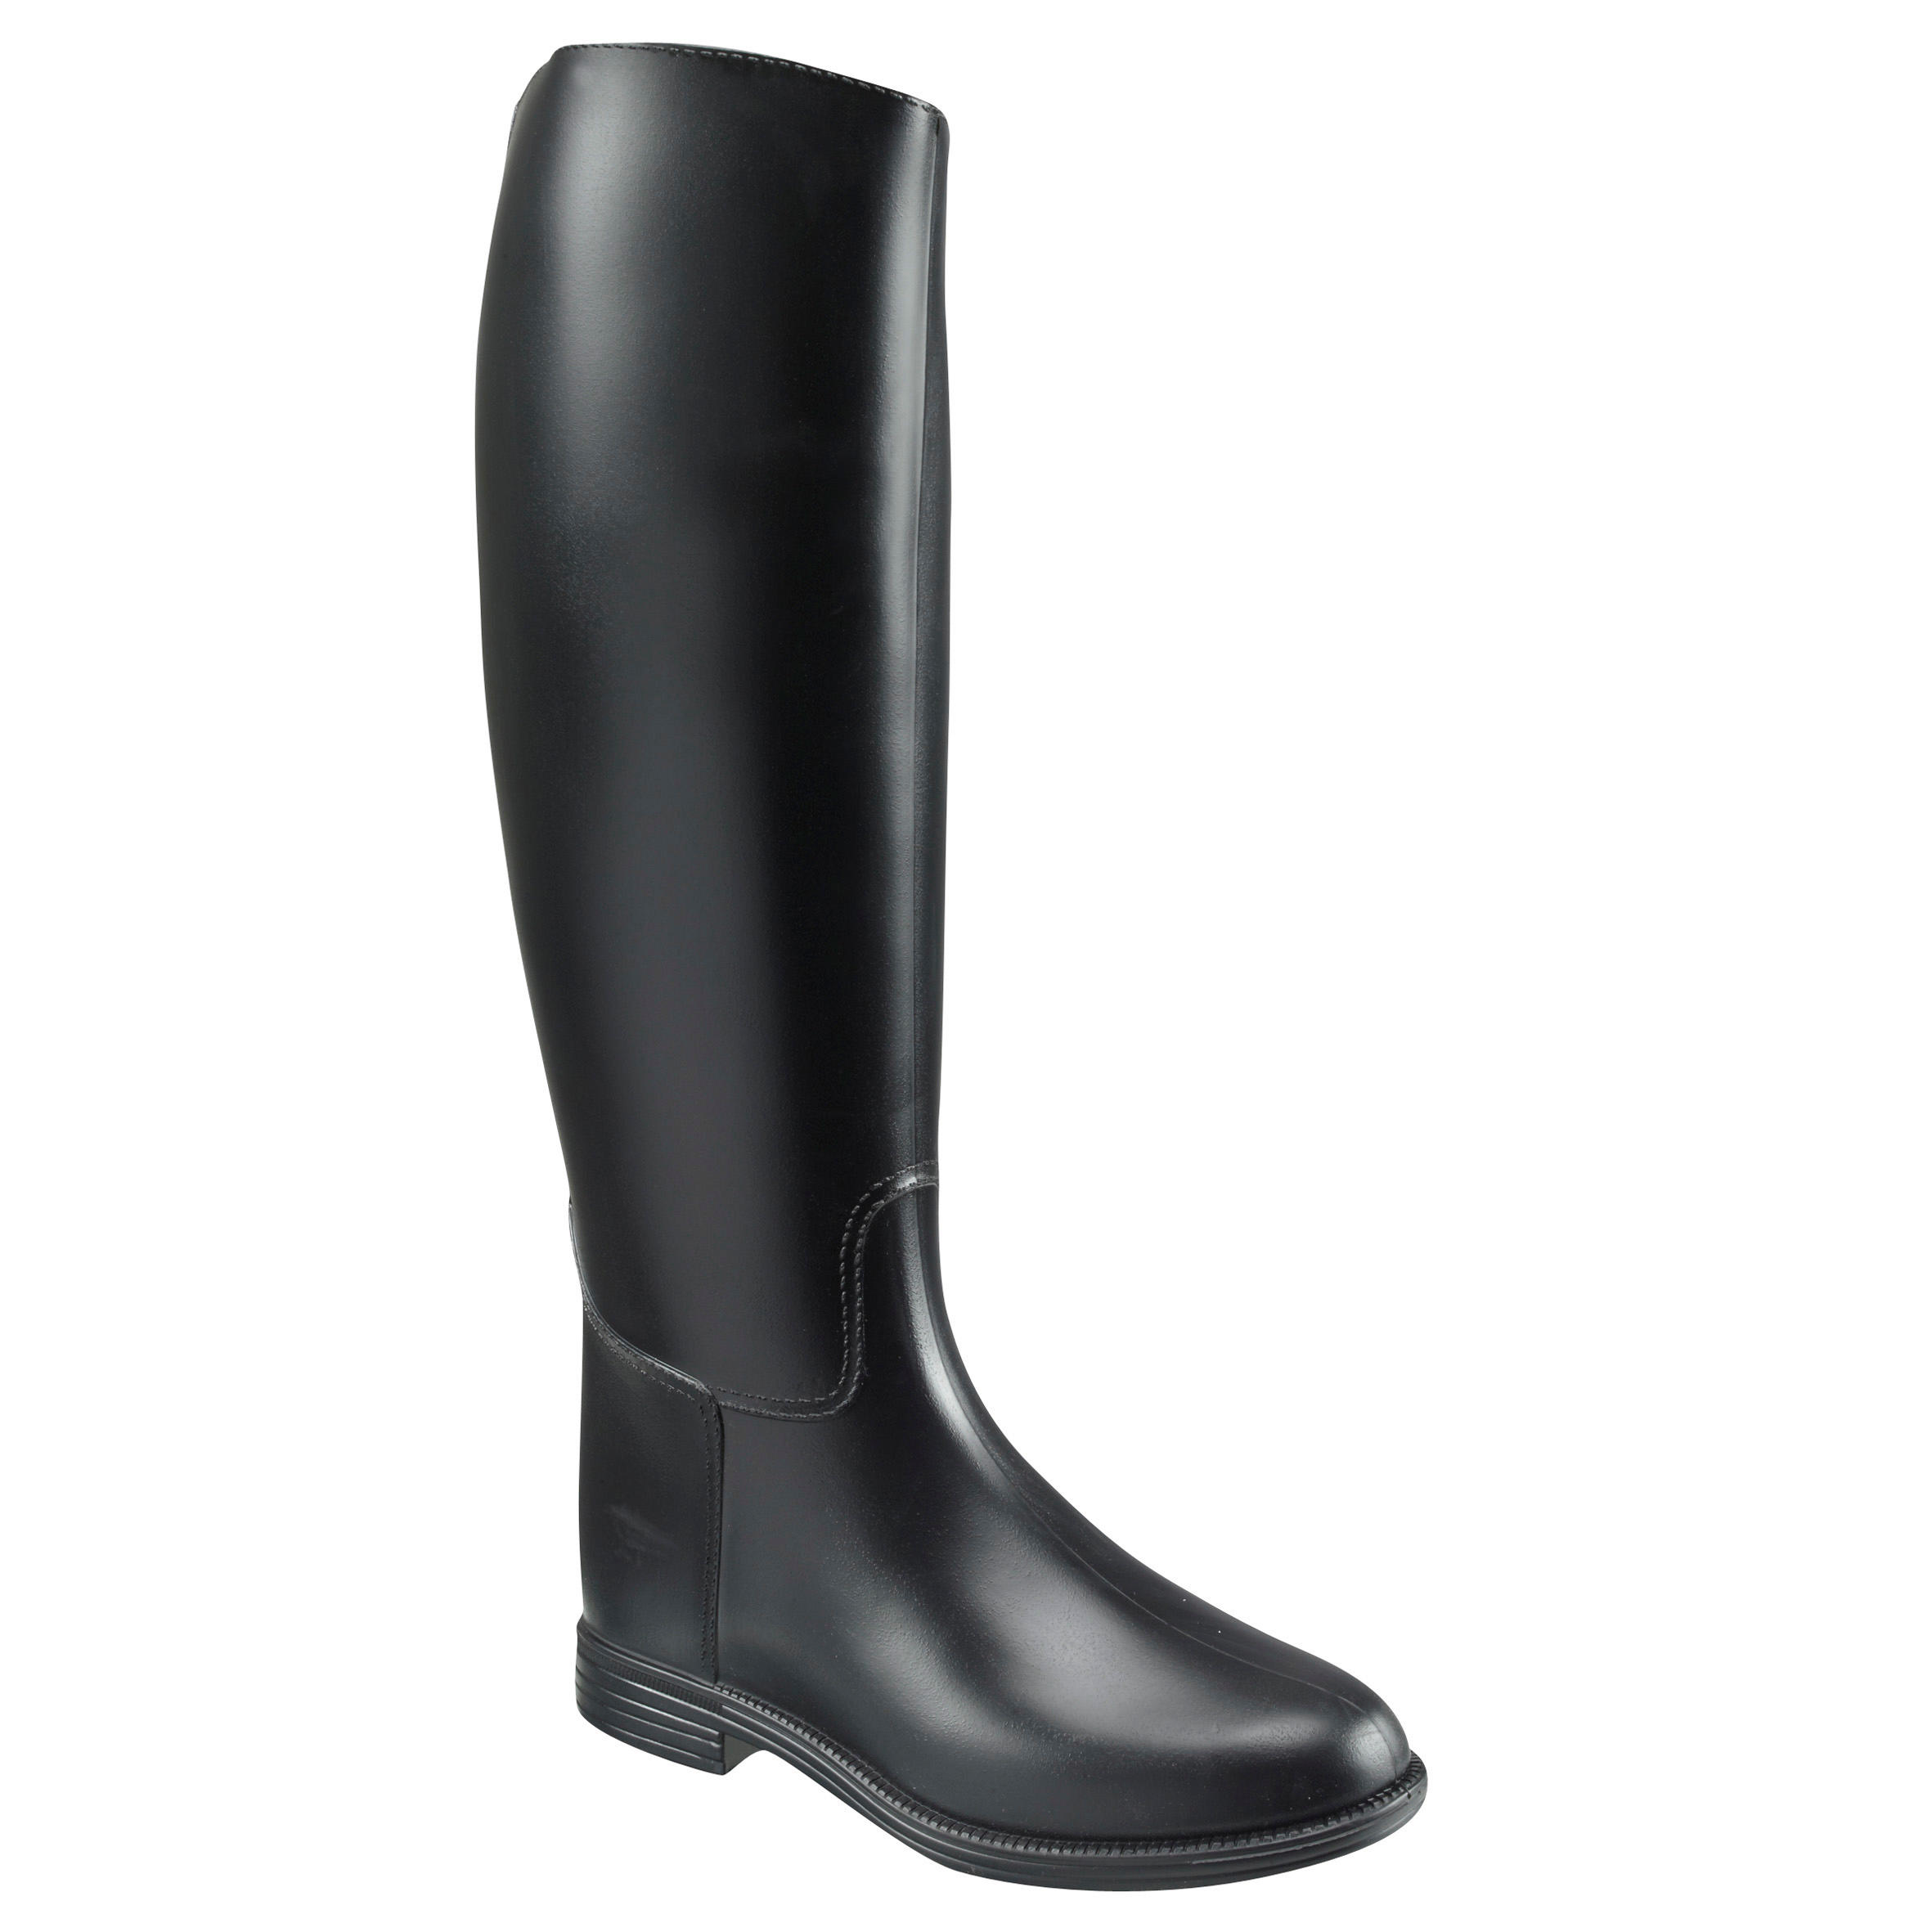 Schooling Adult Horseback Riding Boots - Black